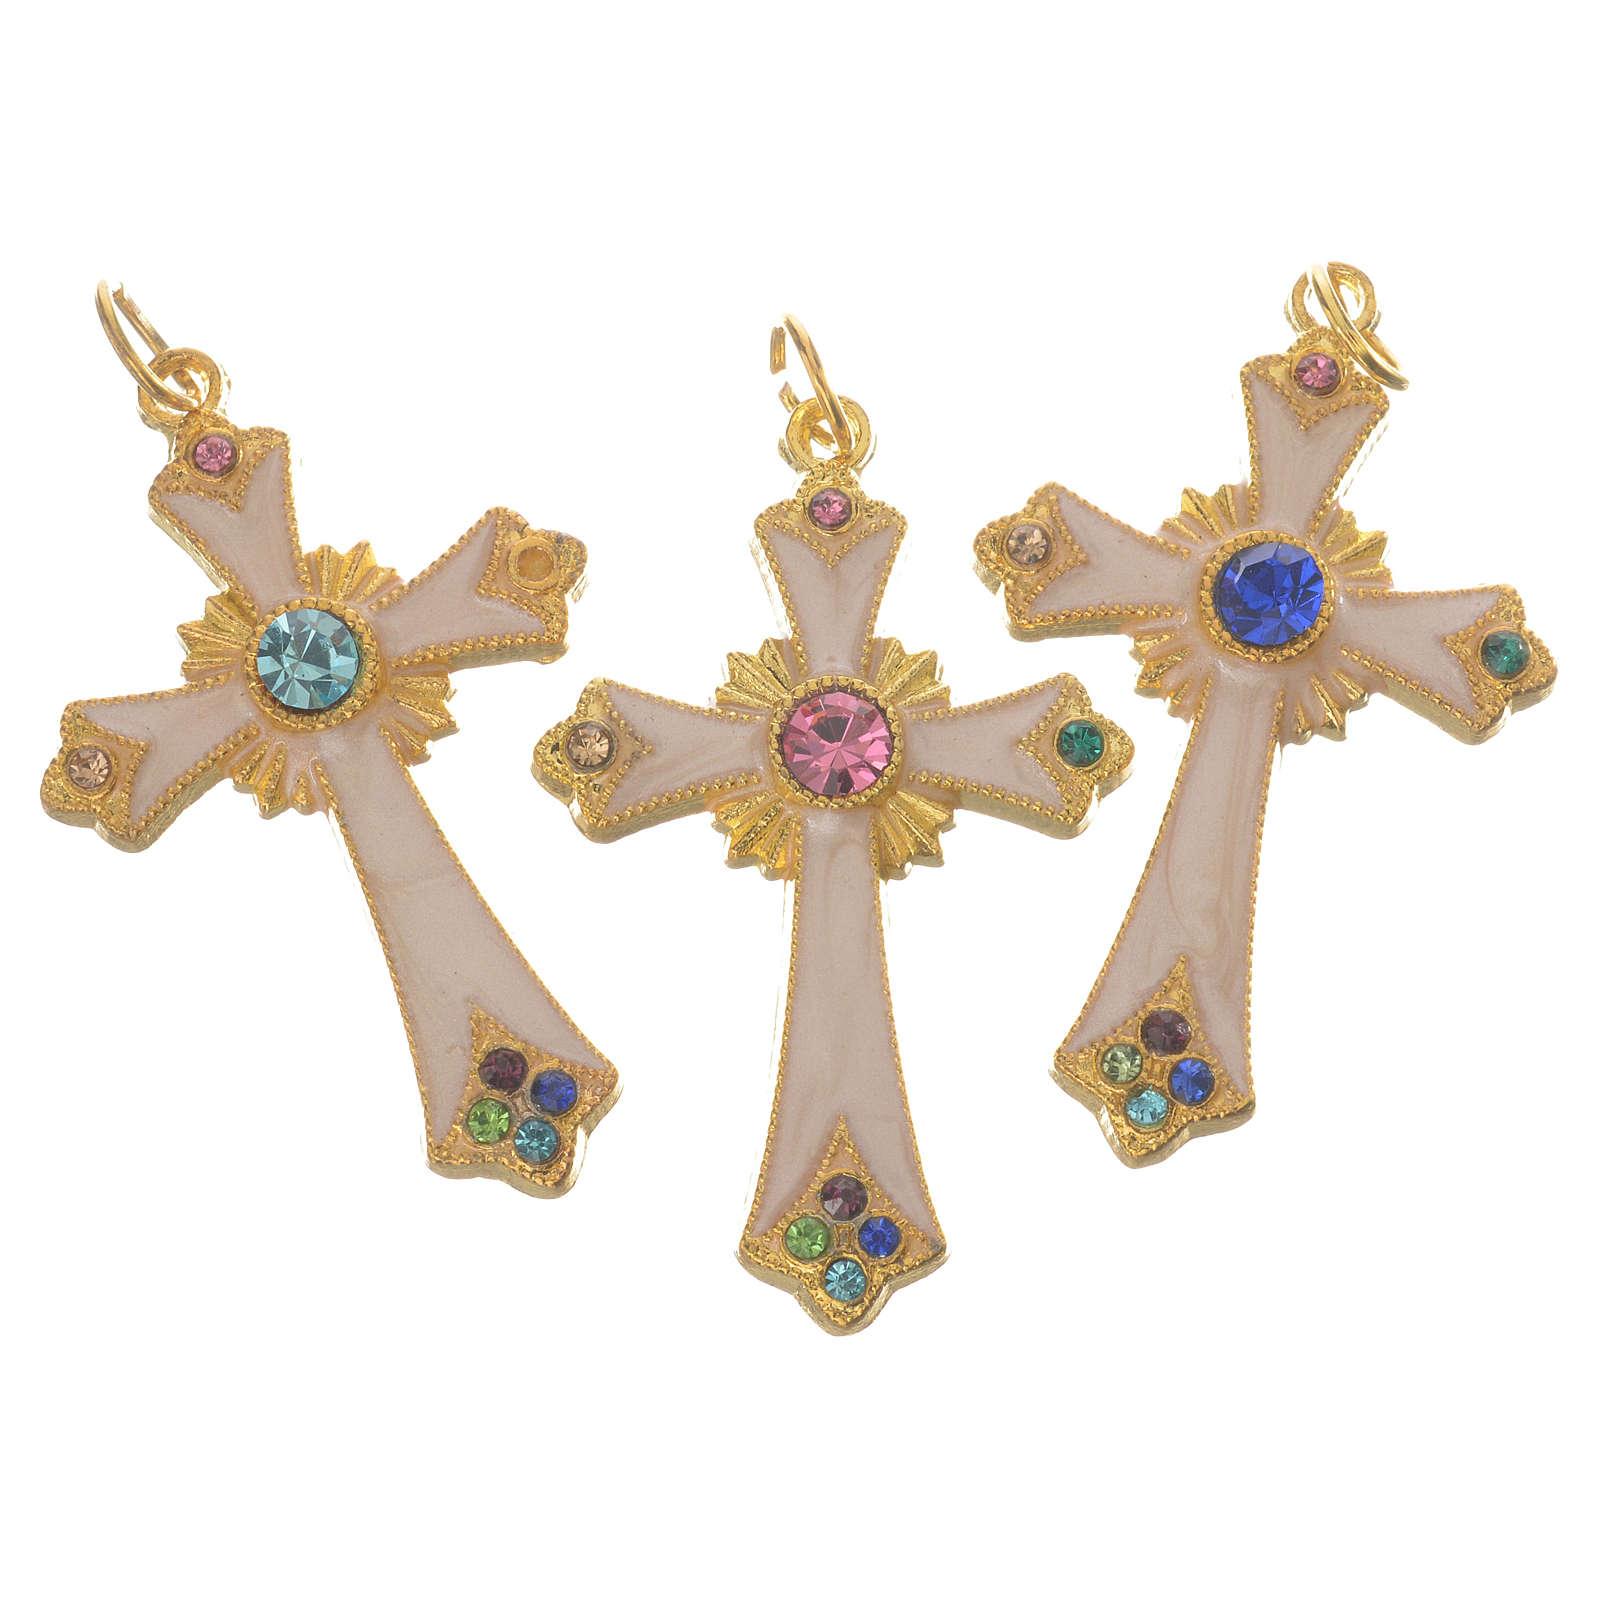 Croix pendentif métal doré 4